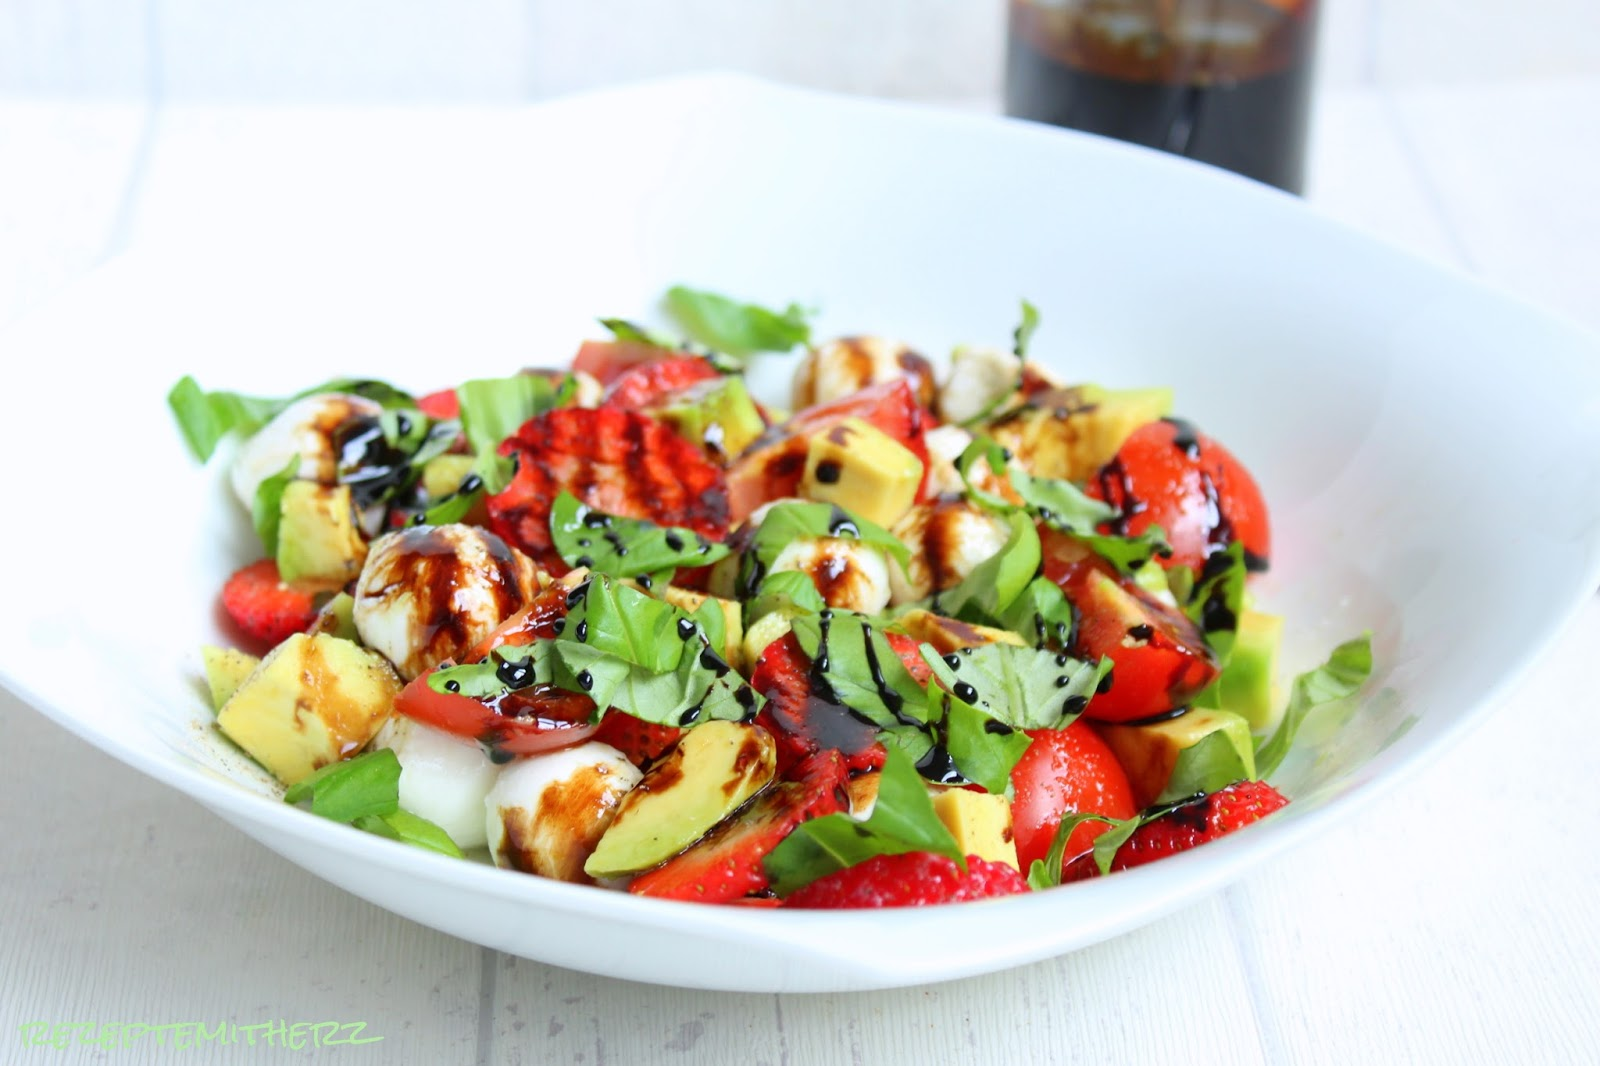 rezepte mit herz caprese salat mit erdbeeren und avocado. Black Bedroom Furniture Sets. Home Design Ideas